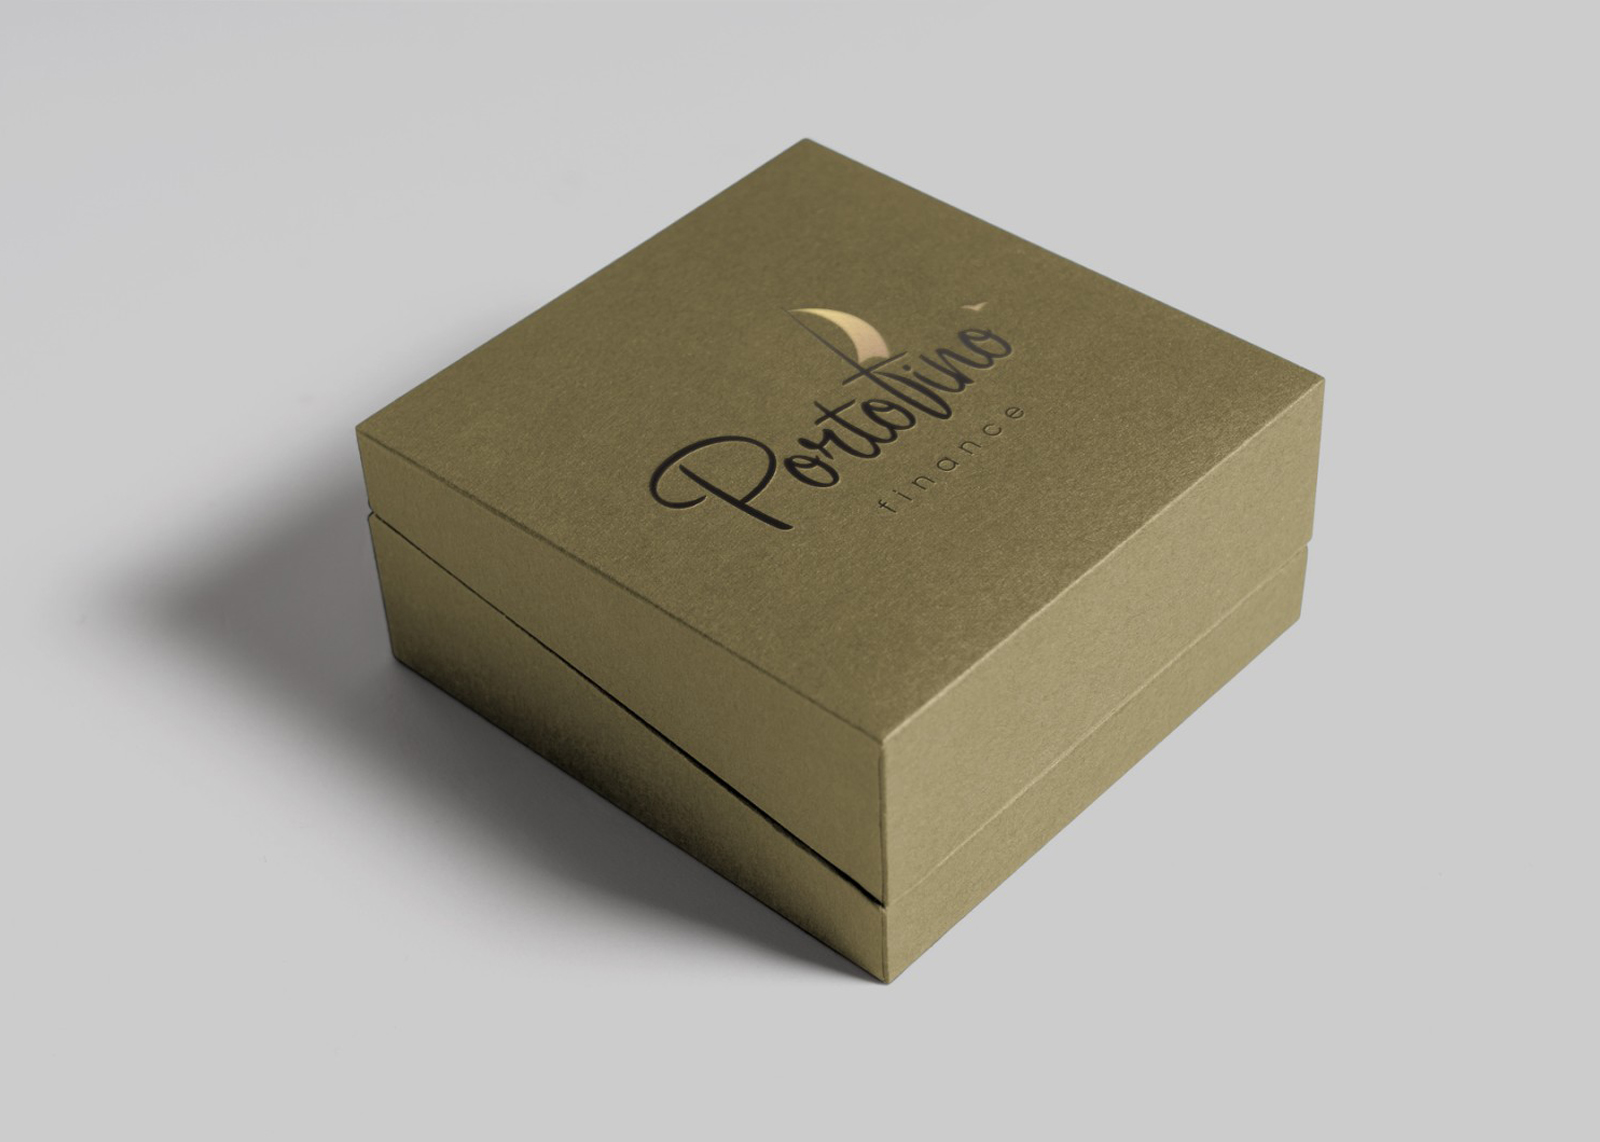 Визуализация логотипа Portafino на коробке